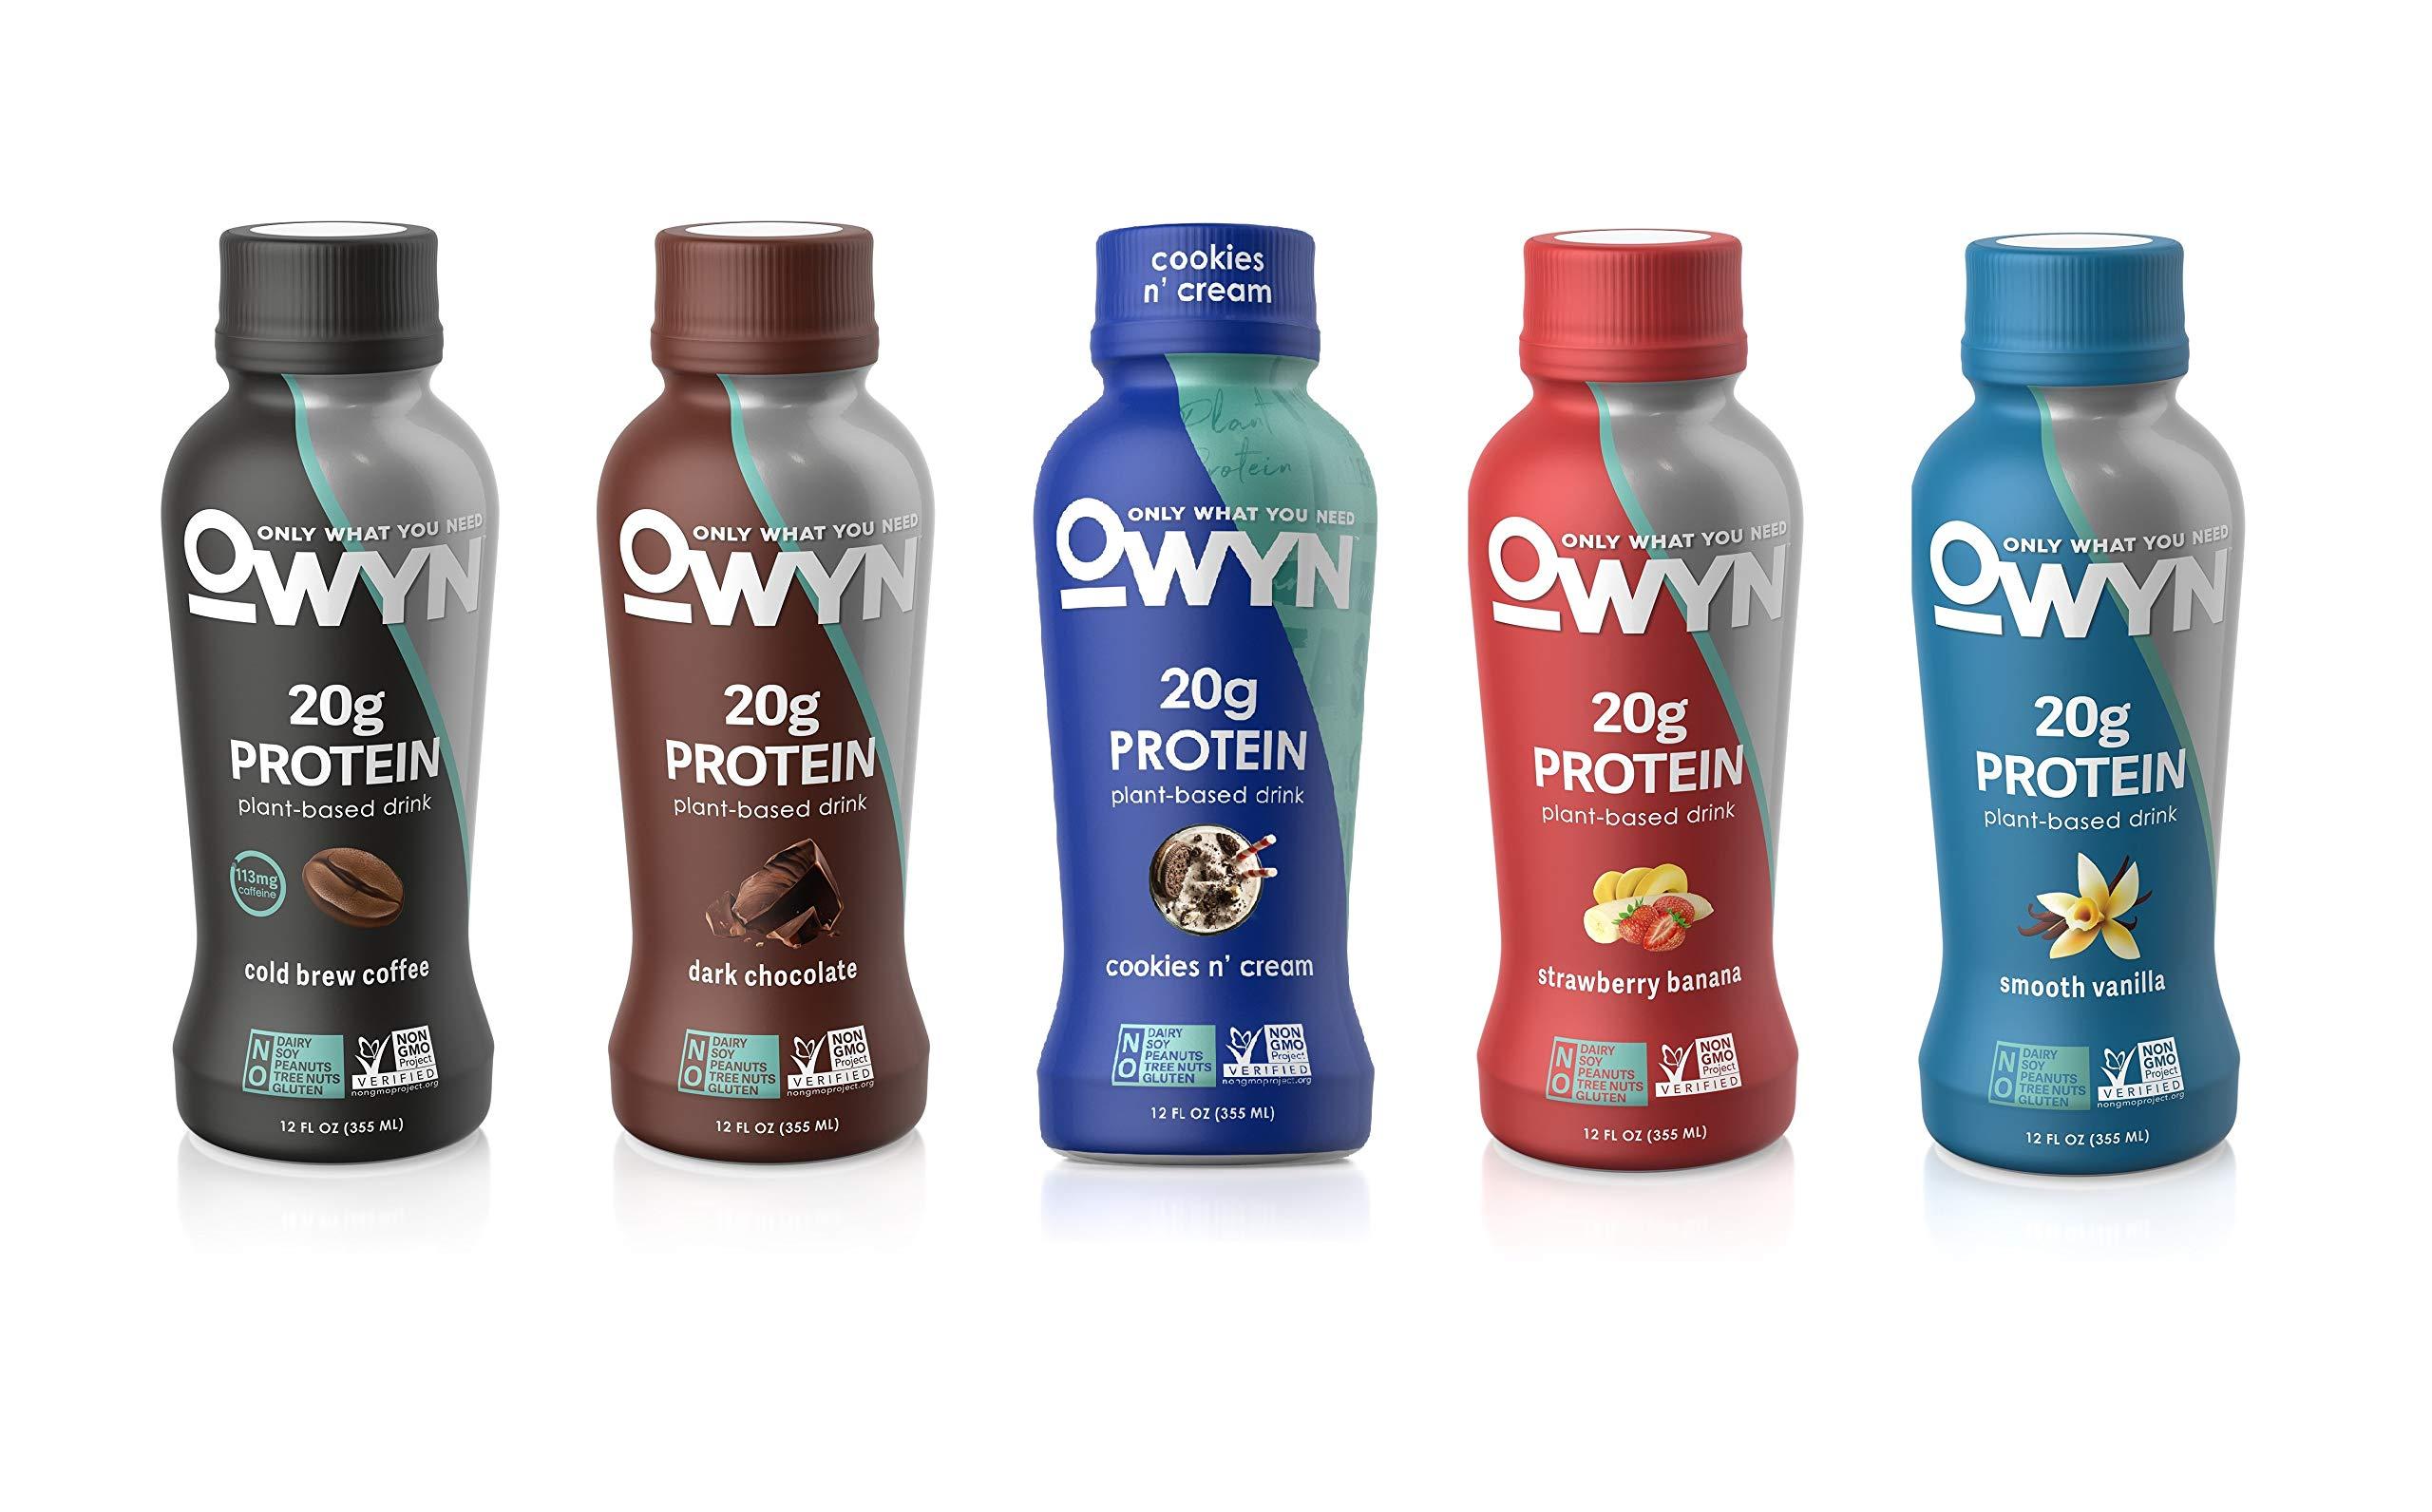 OWYN, Vegan Protein Shake, 5 Flavor Variety Pack ,12 Fl Oz, 100-Percent Plant-Based, Dairy-Free, Gluten-Free, Soy-Free, Tree Nut-Free, Egg-Free, Allergy-Free, Vegetarian, Kosher (Pack of 5)